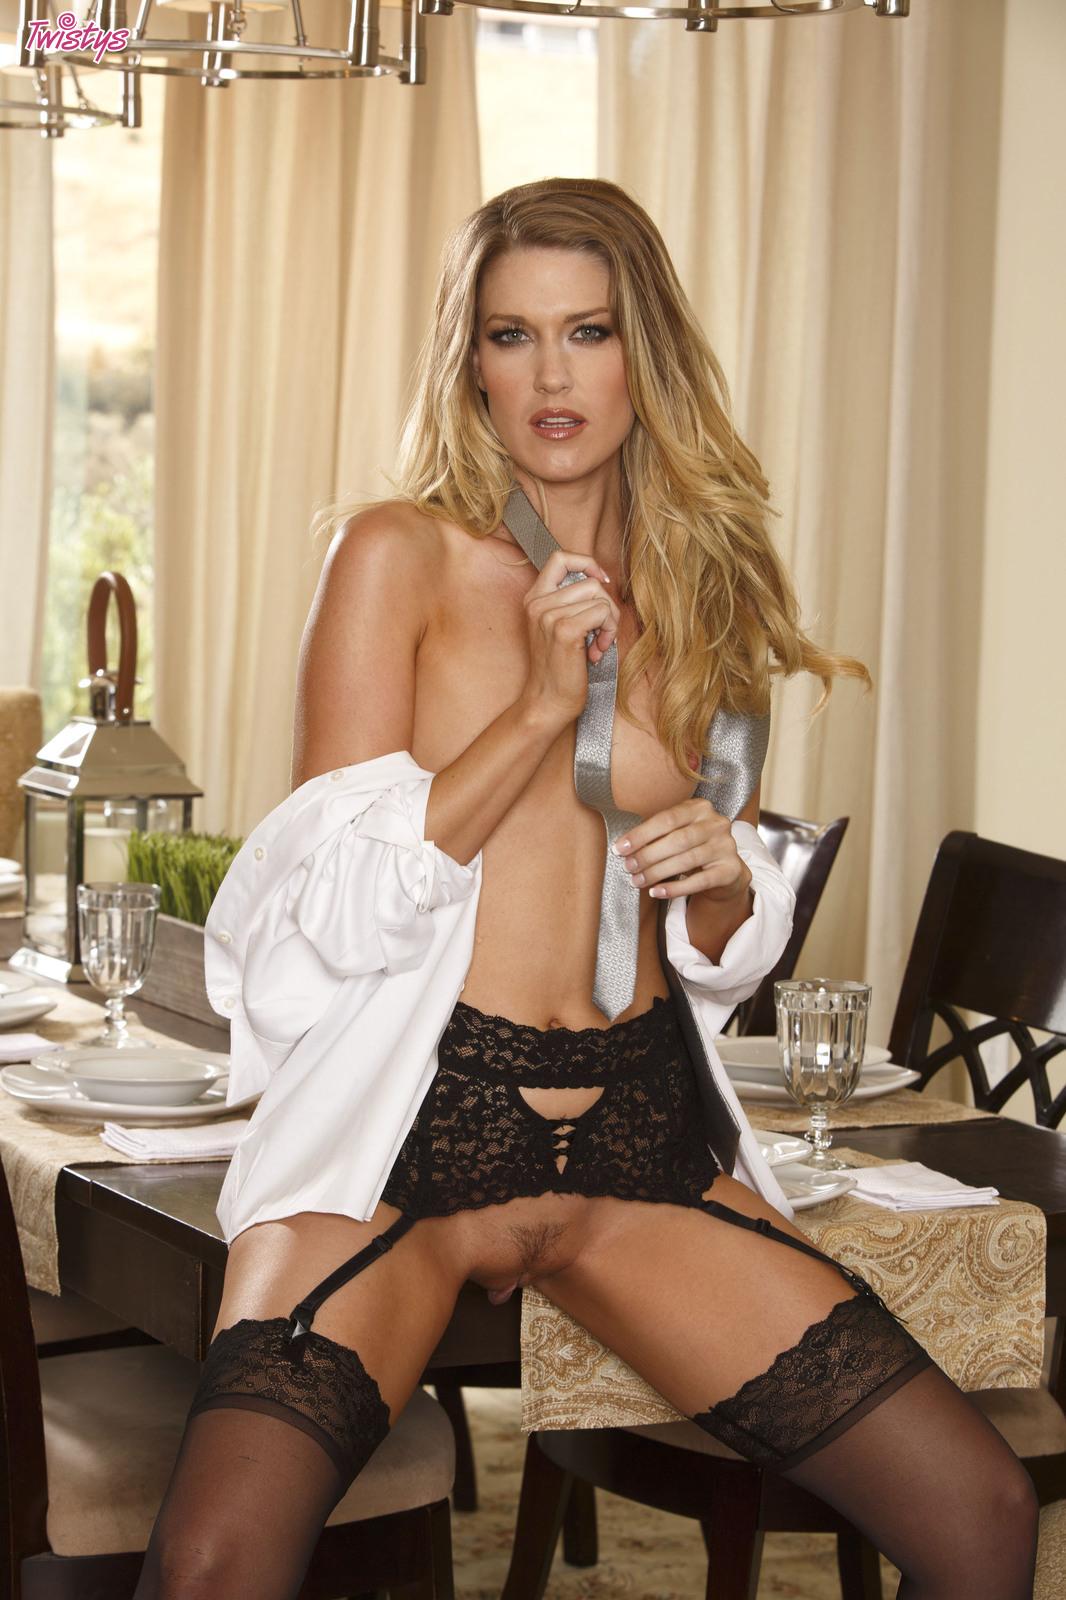 fucking-hot-naked-women-modeling-with-legs-open